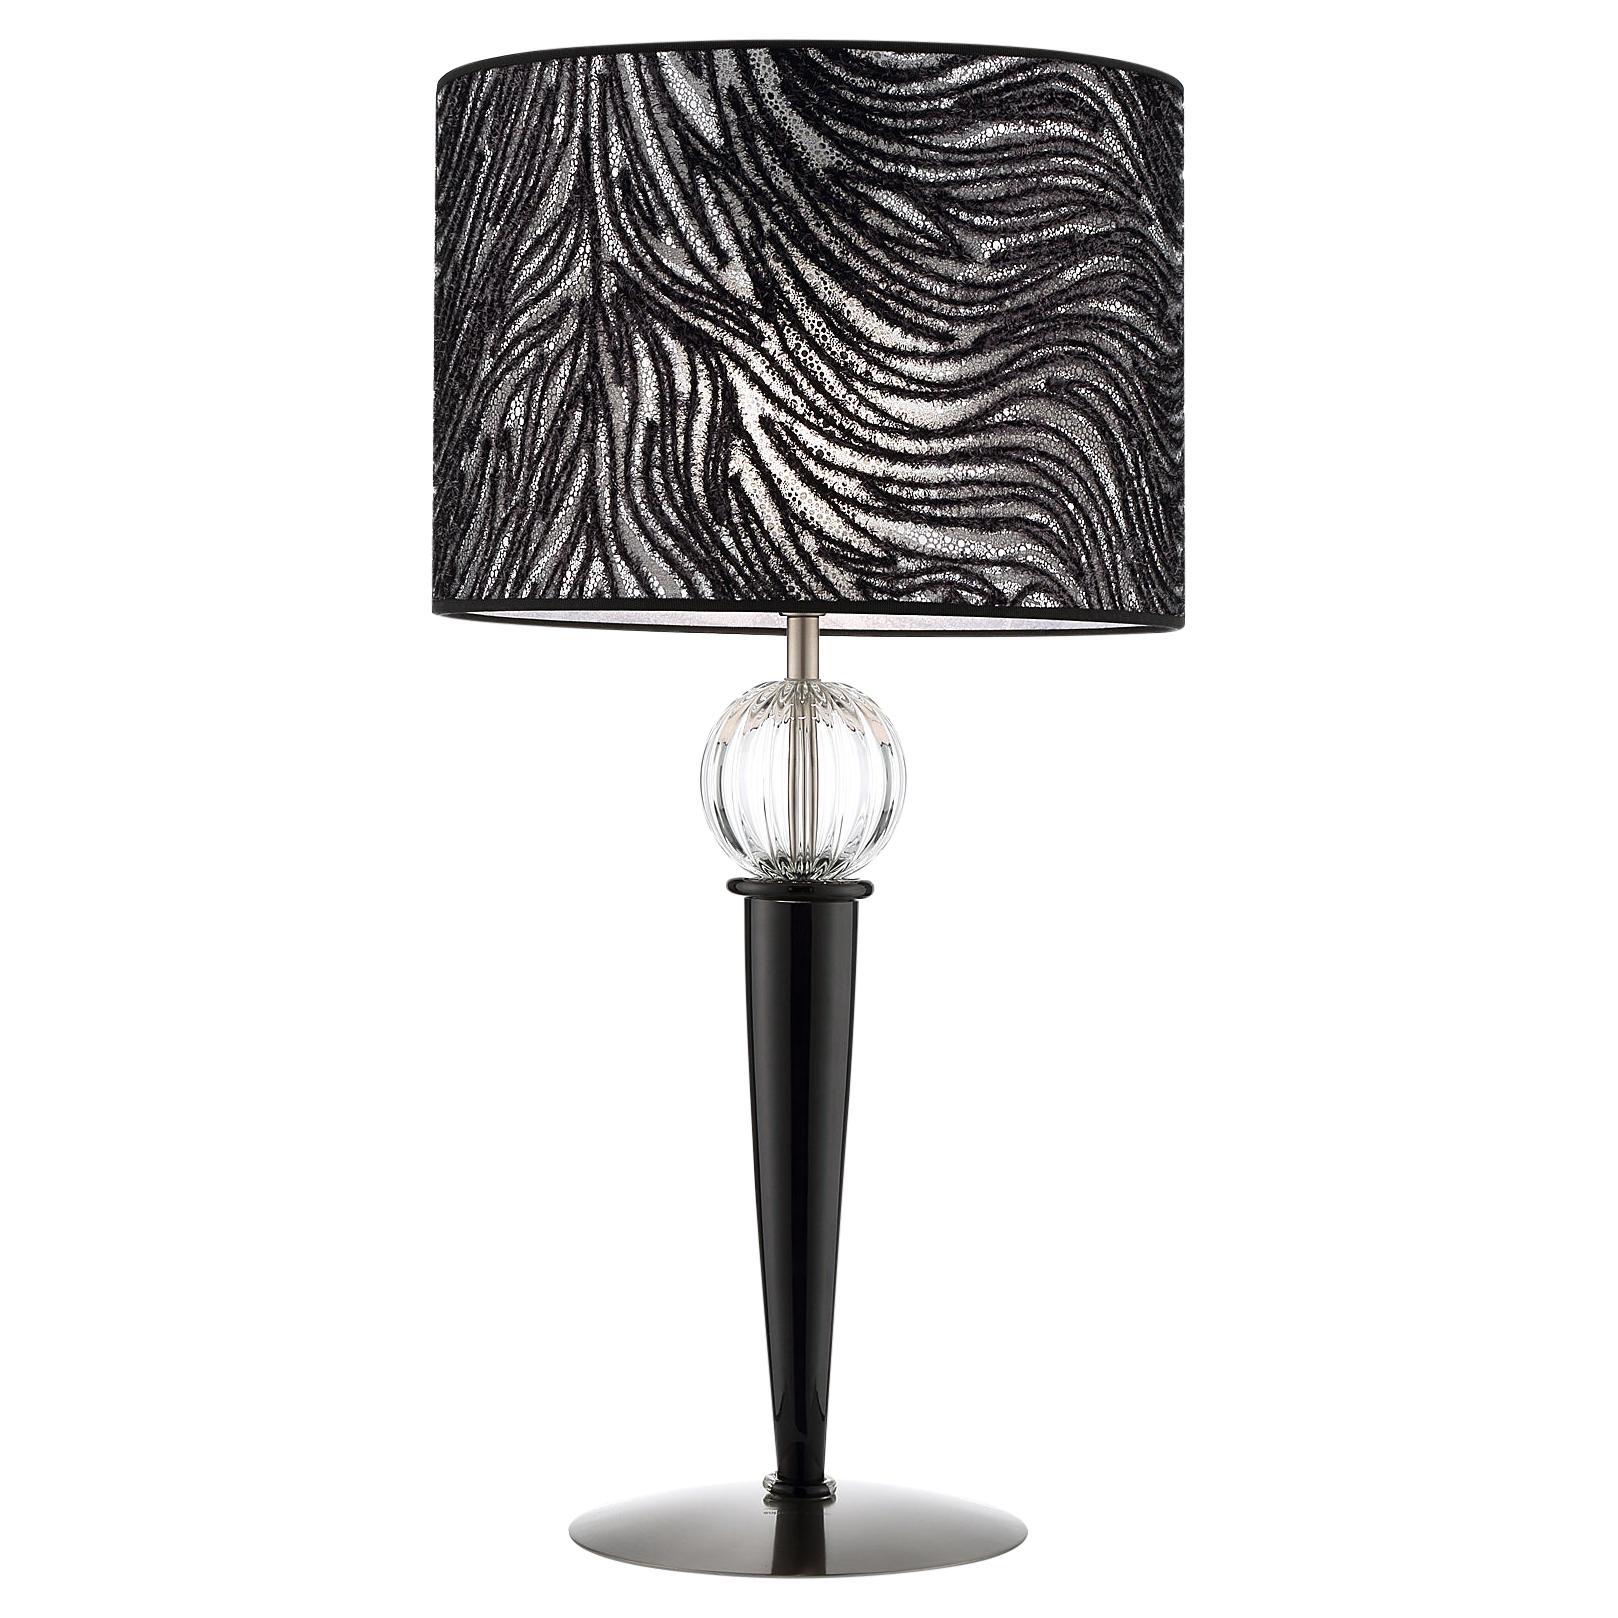 Artistic Handmade Table Lamp Tangeri, by La Murrina